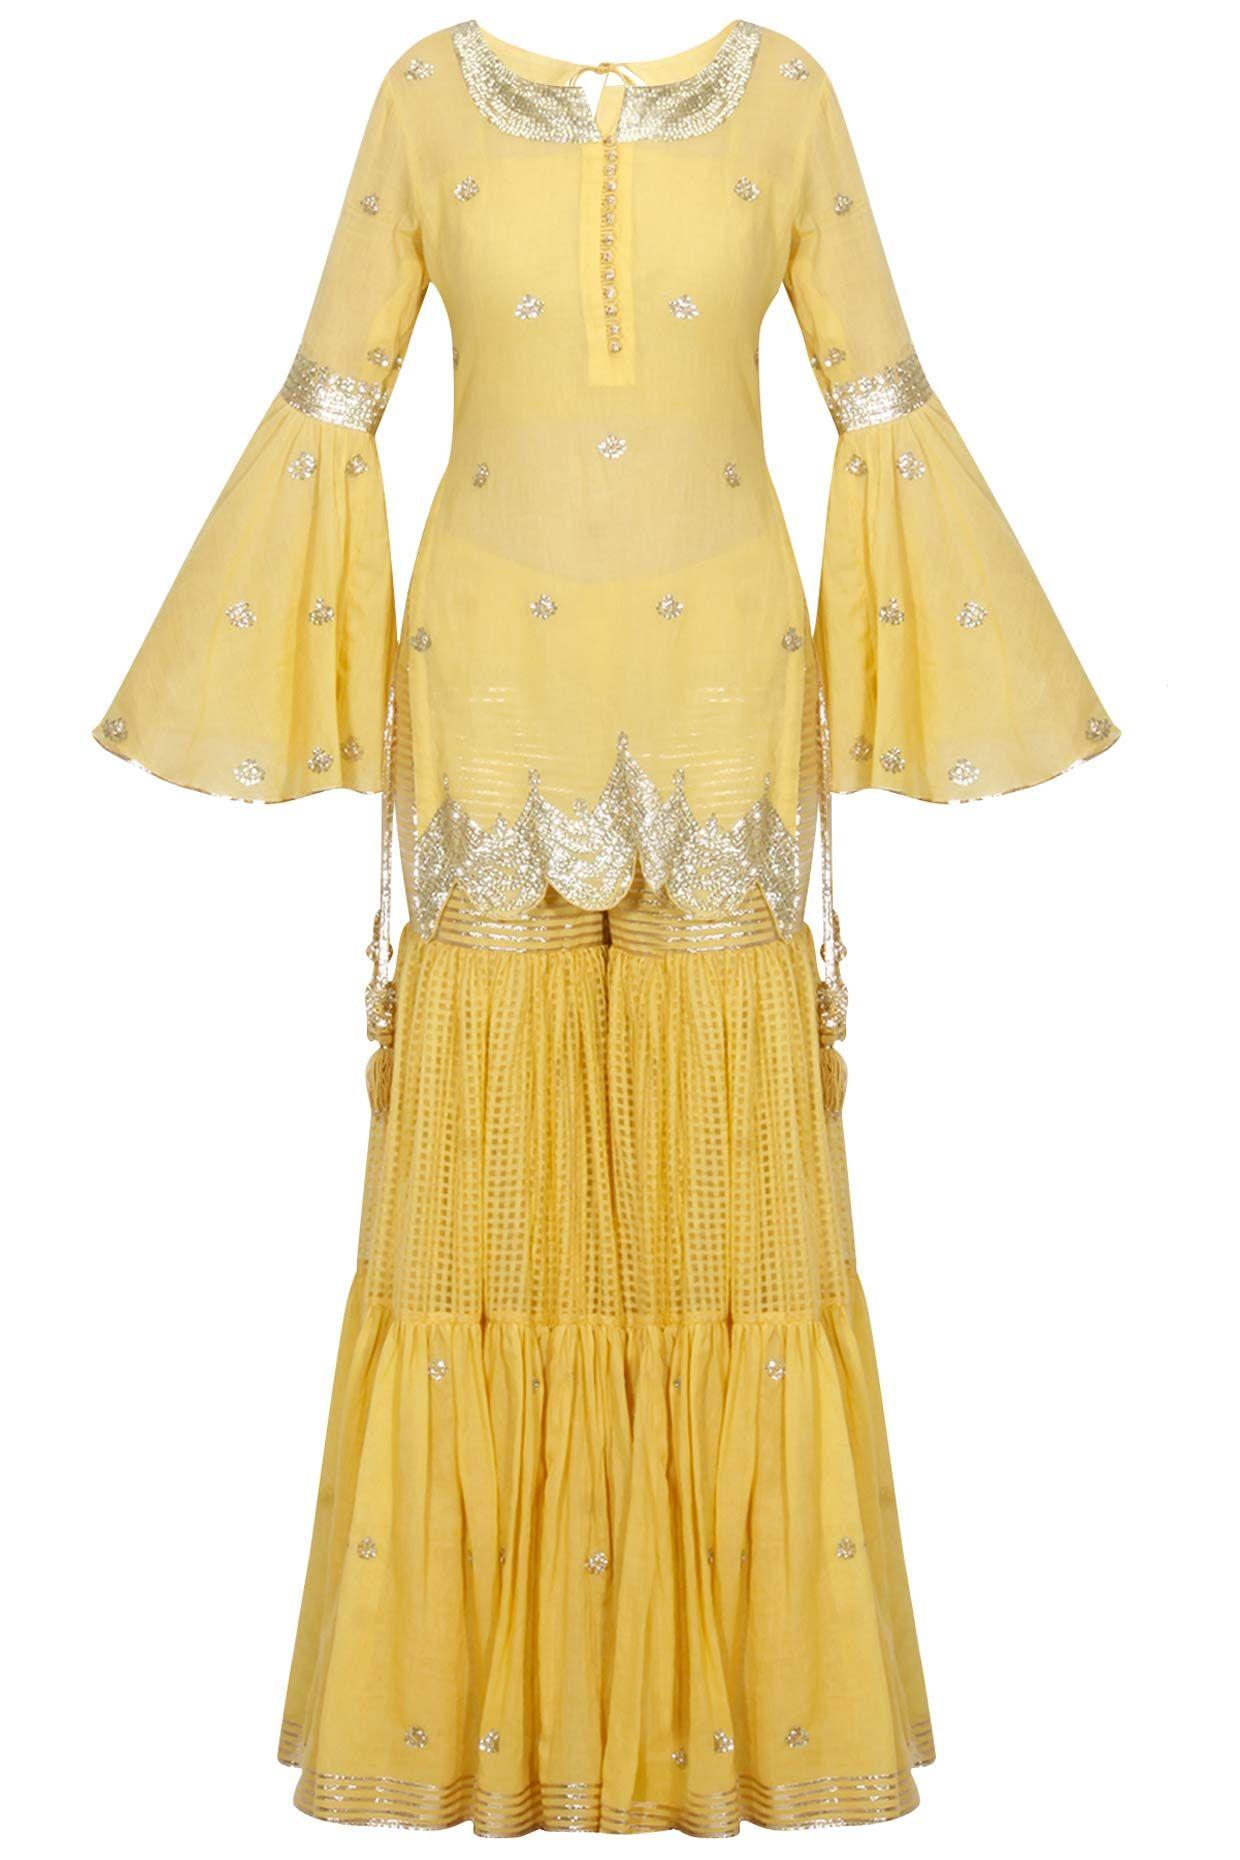 4fb723588 Mustard yellow and gold gota patti work kurta and sharara set available  only at Pernia's Pop Up Shop.